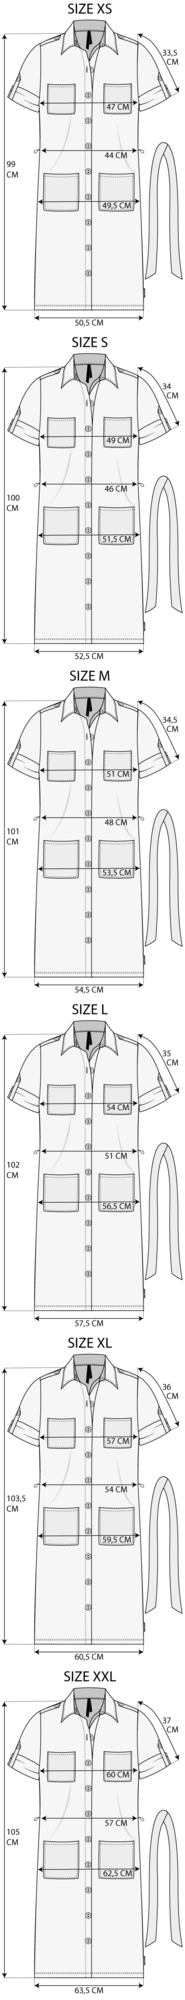 Maattabel Dress